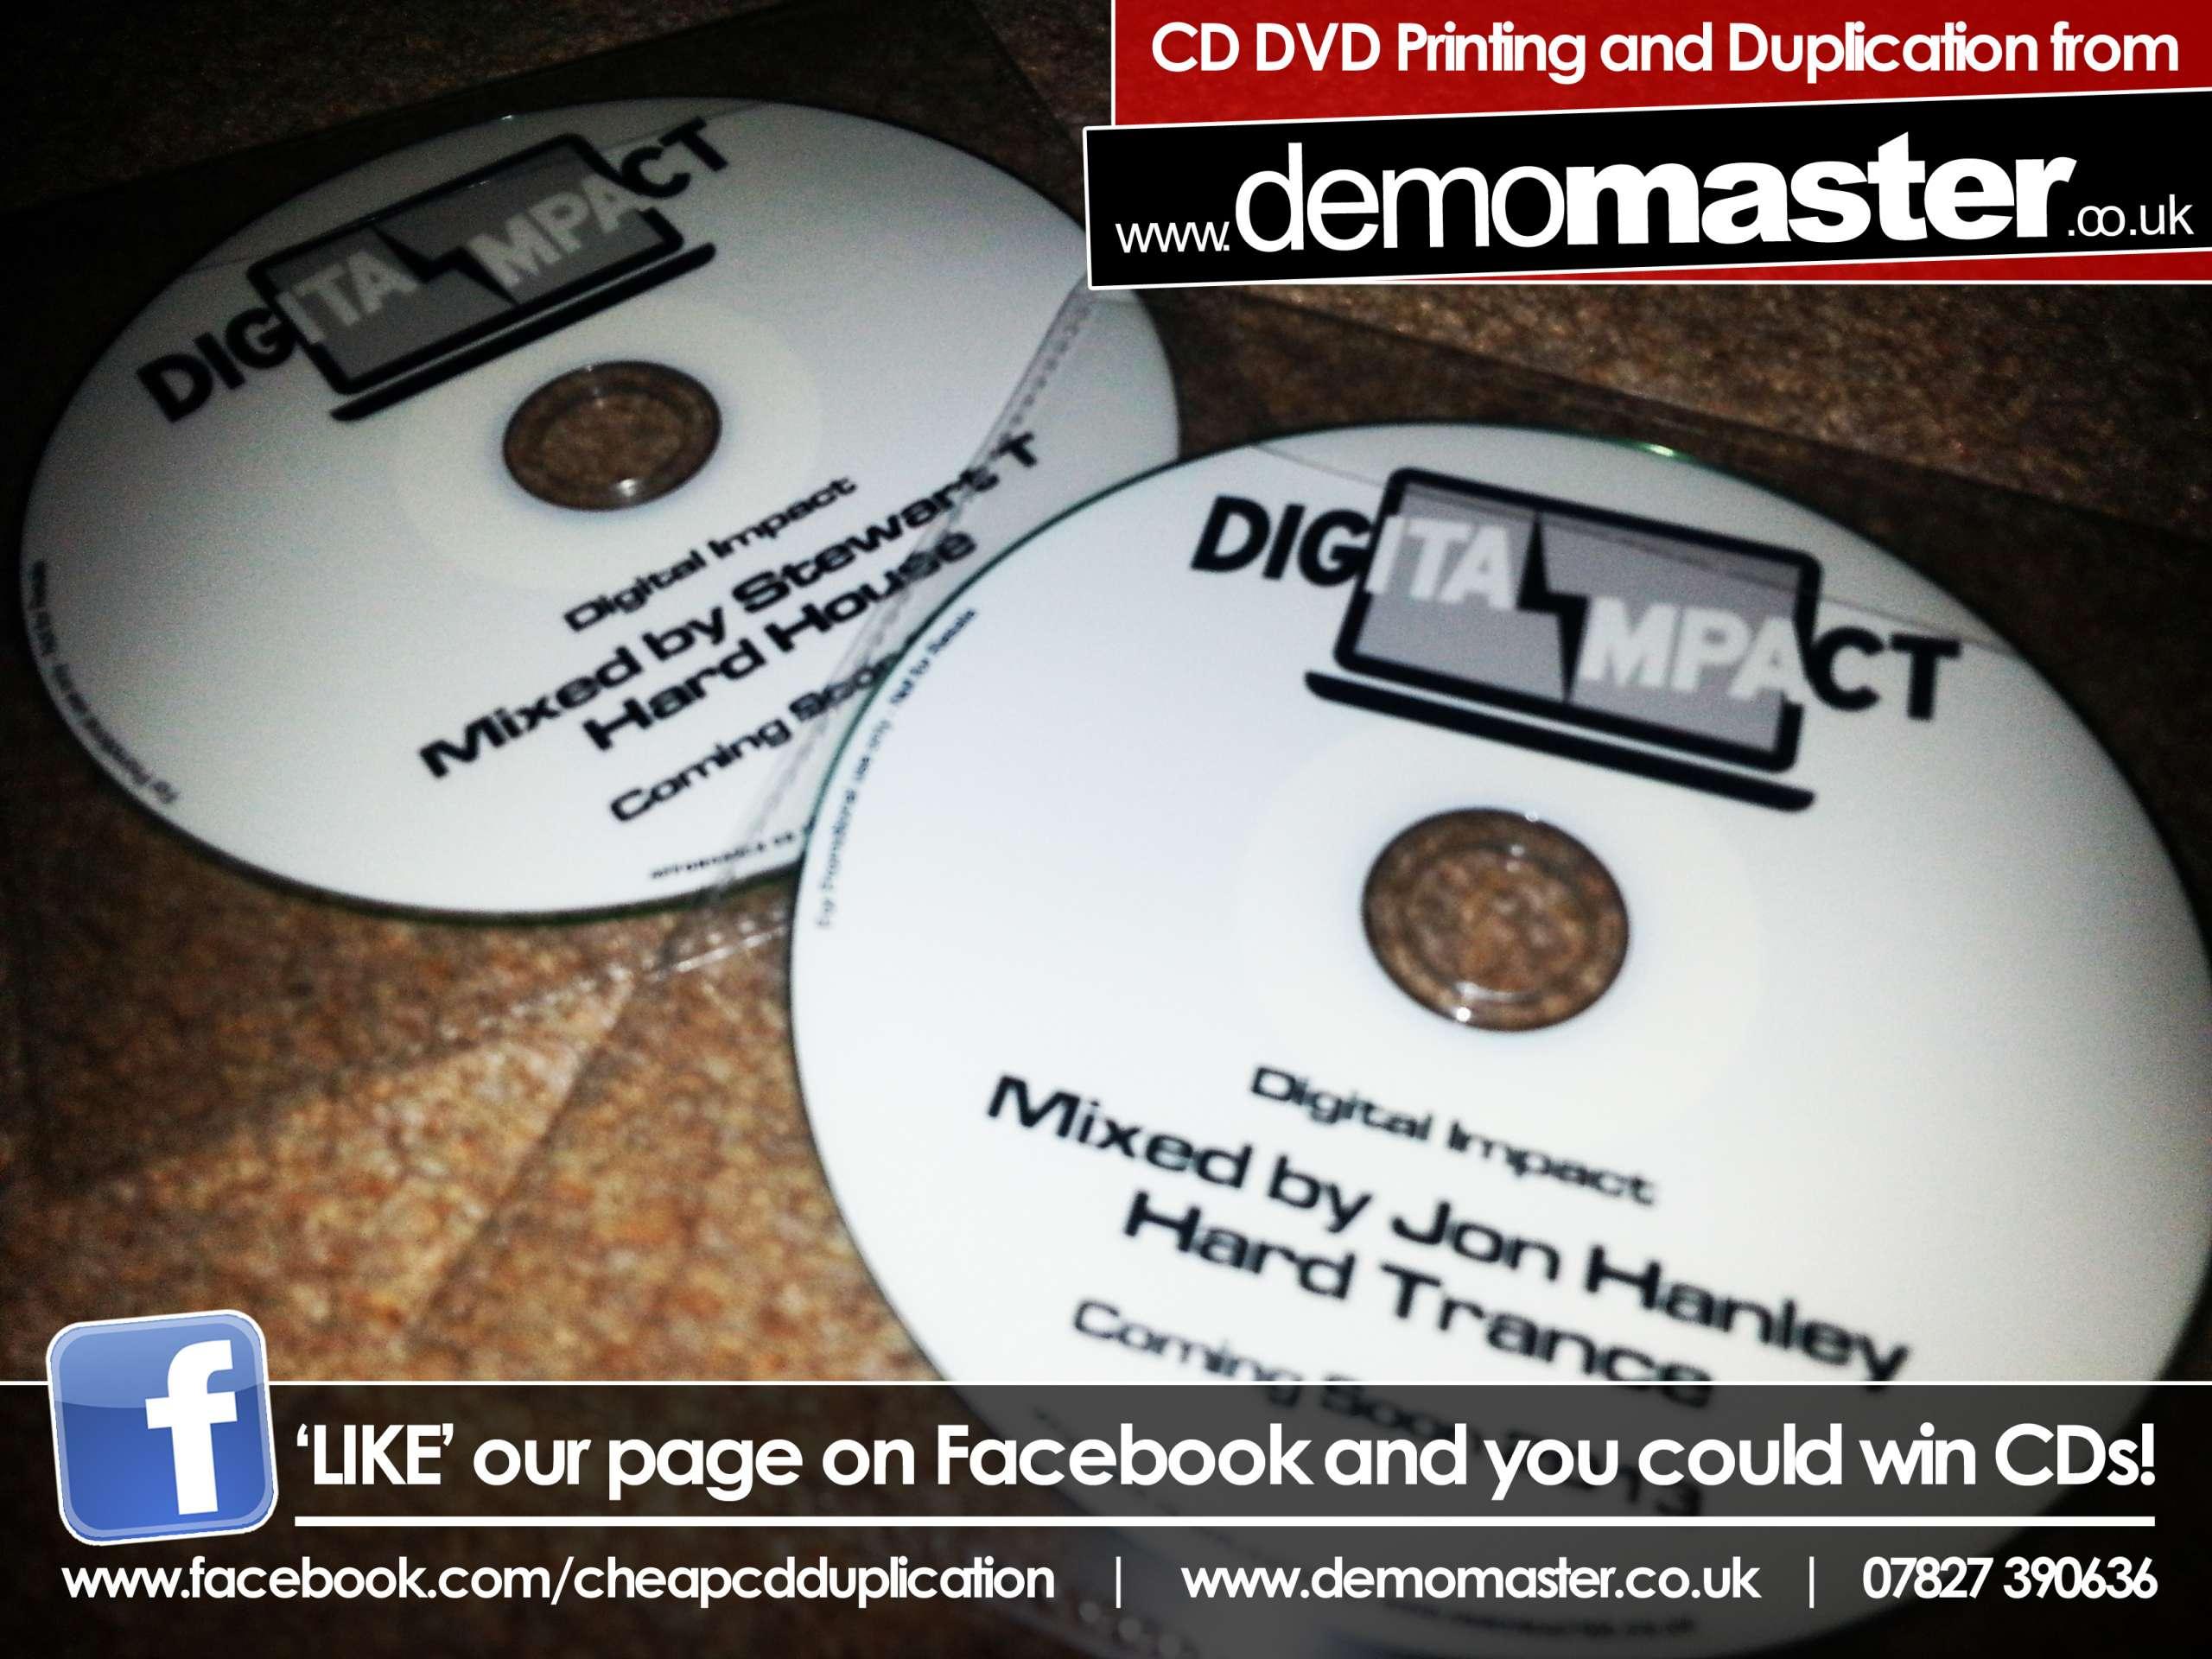 Digital Impact mixed by Jon Hanley (Hard Trance)